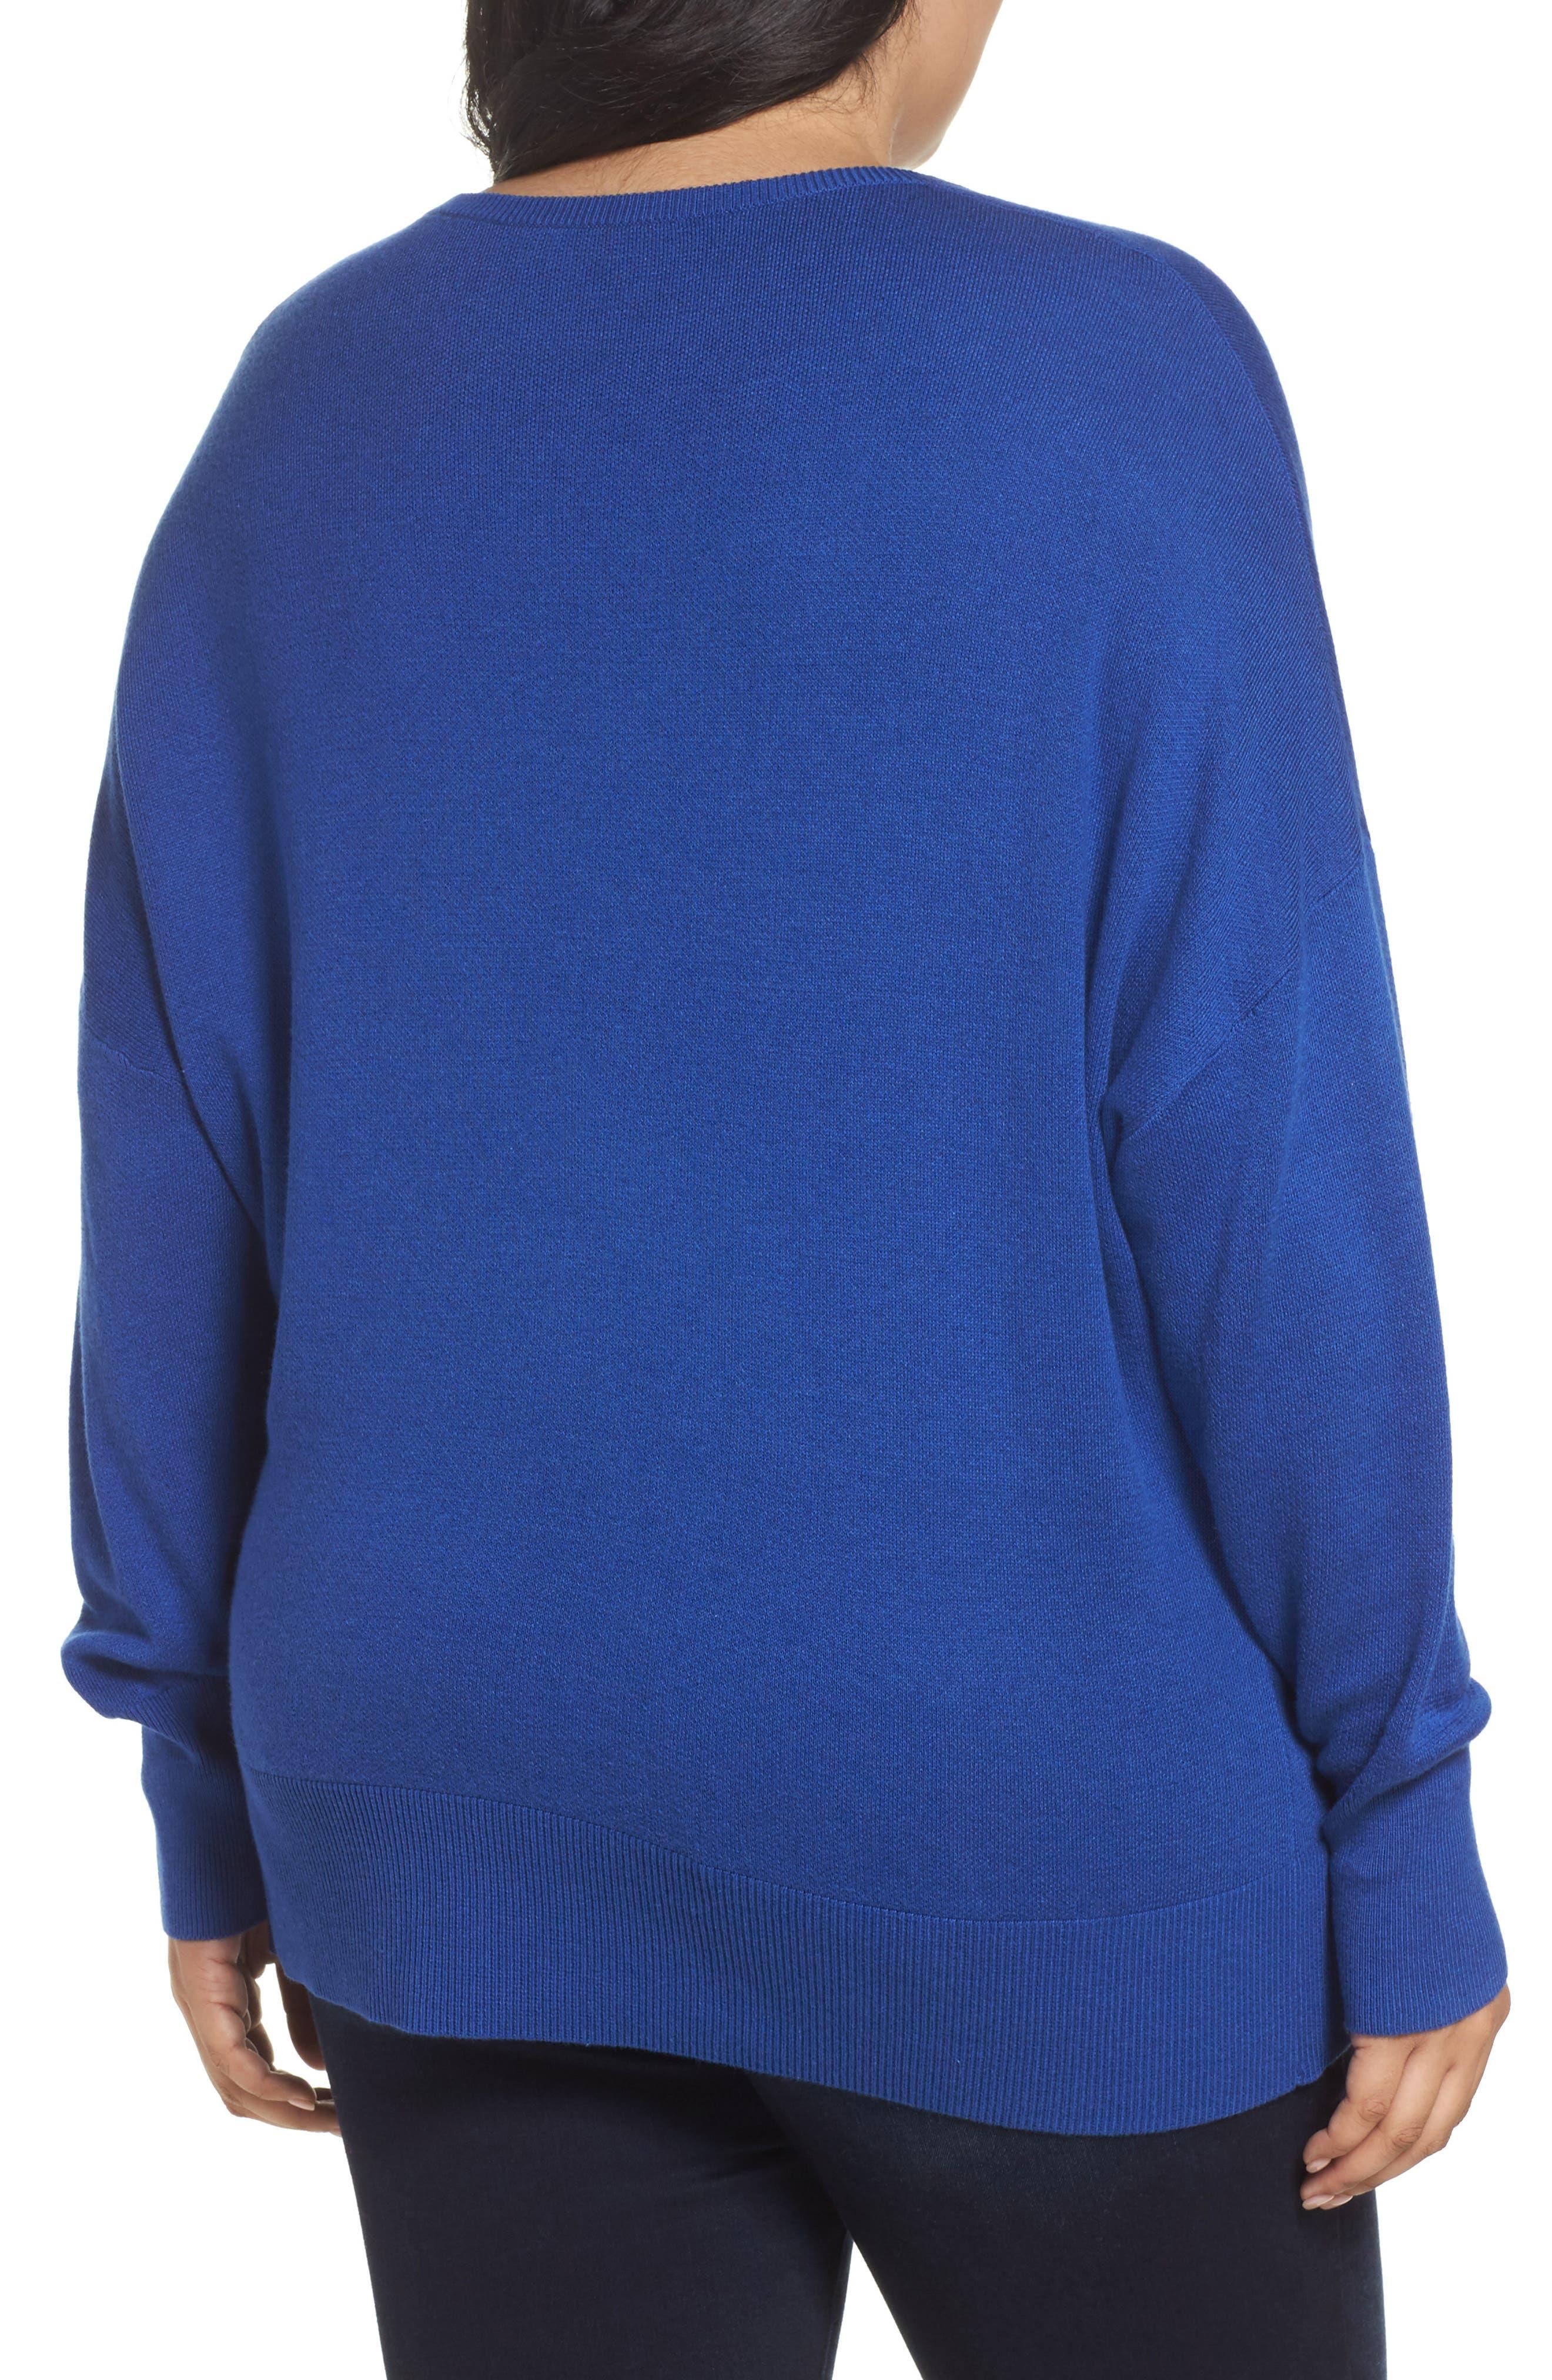 Dolman Sleeve Crewneck Sweater,                             Alternate thumbnail 2, color,                             Blue Mazarine